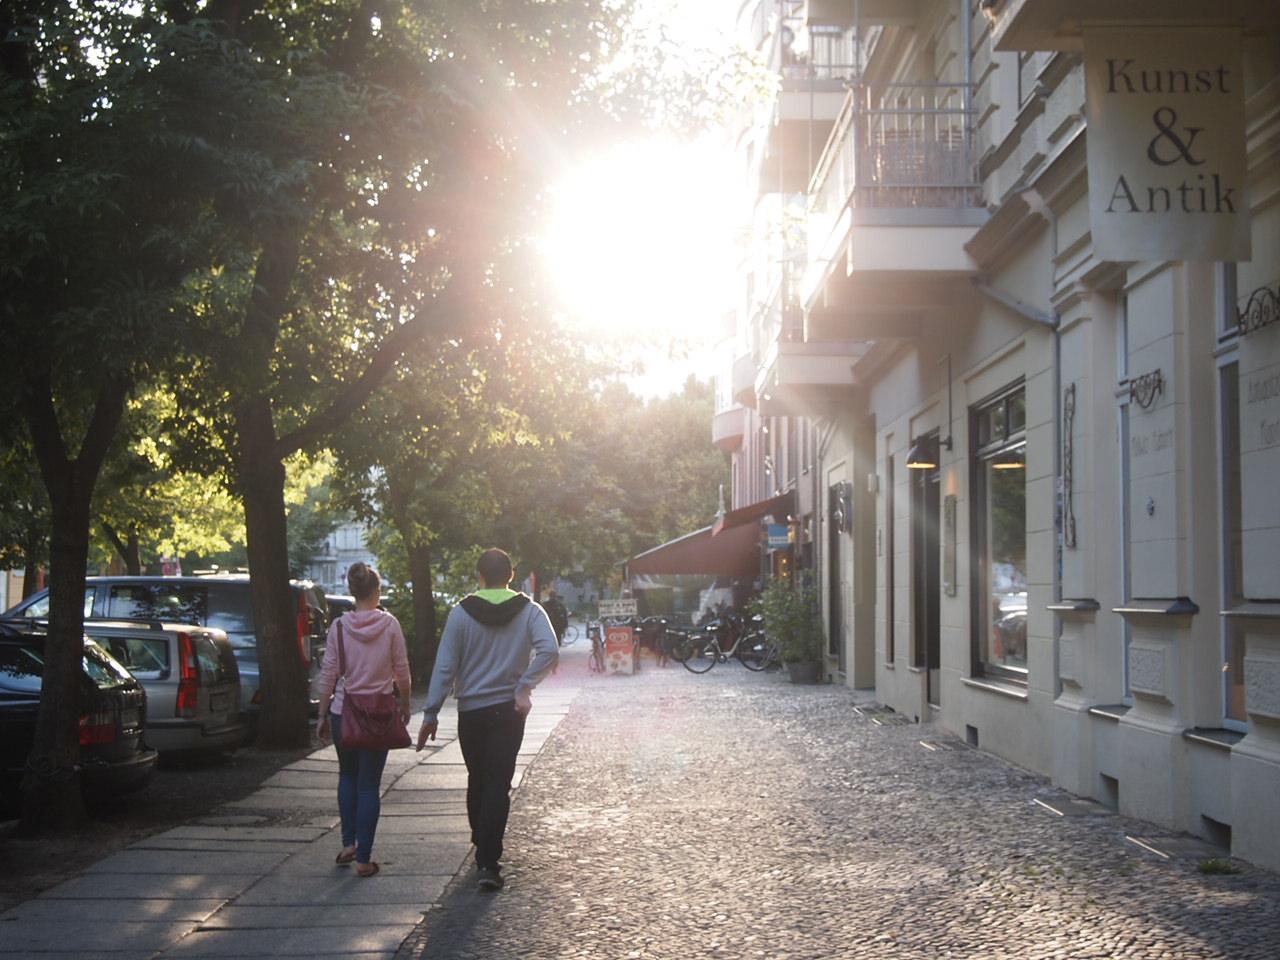 P6306259 アートと自然の多いベルリンの街並み